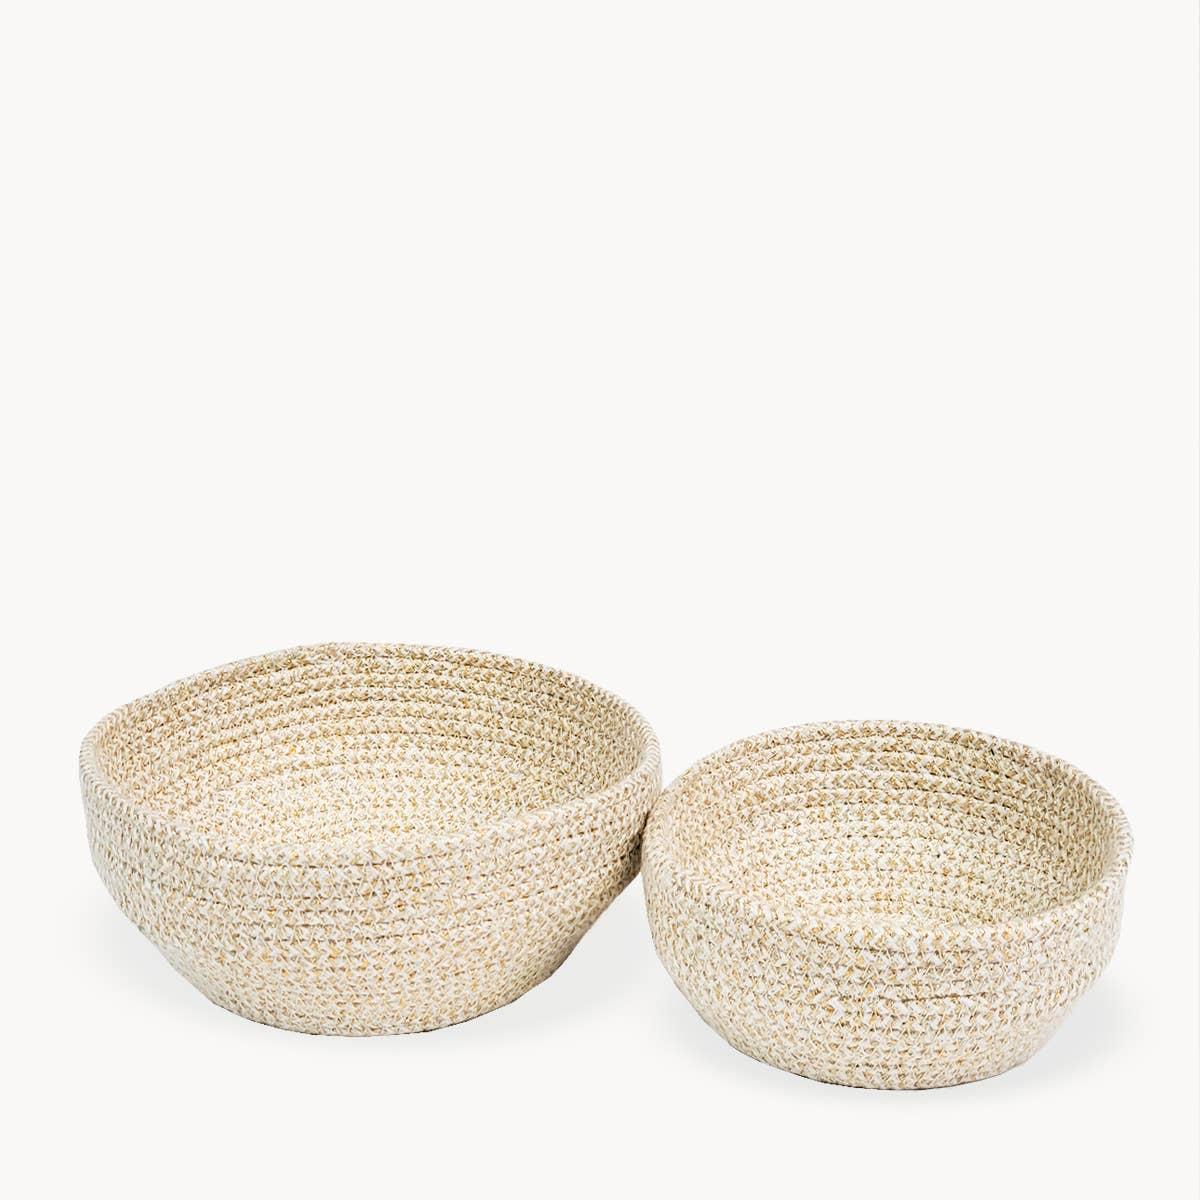 Glitter Bowl - White (Set of 2) | Trada Marketplace